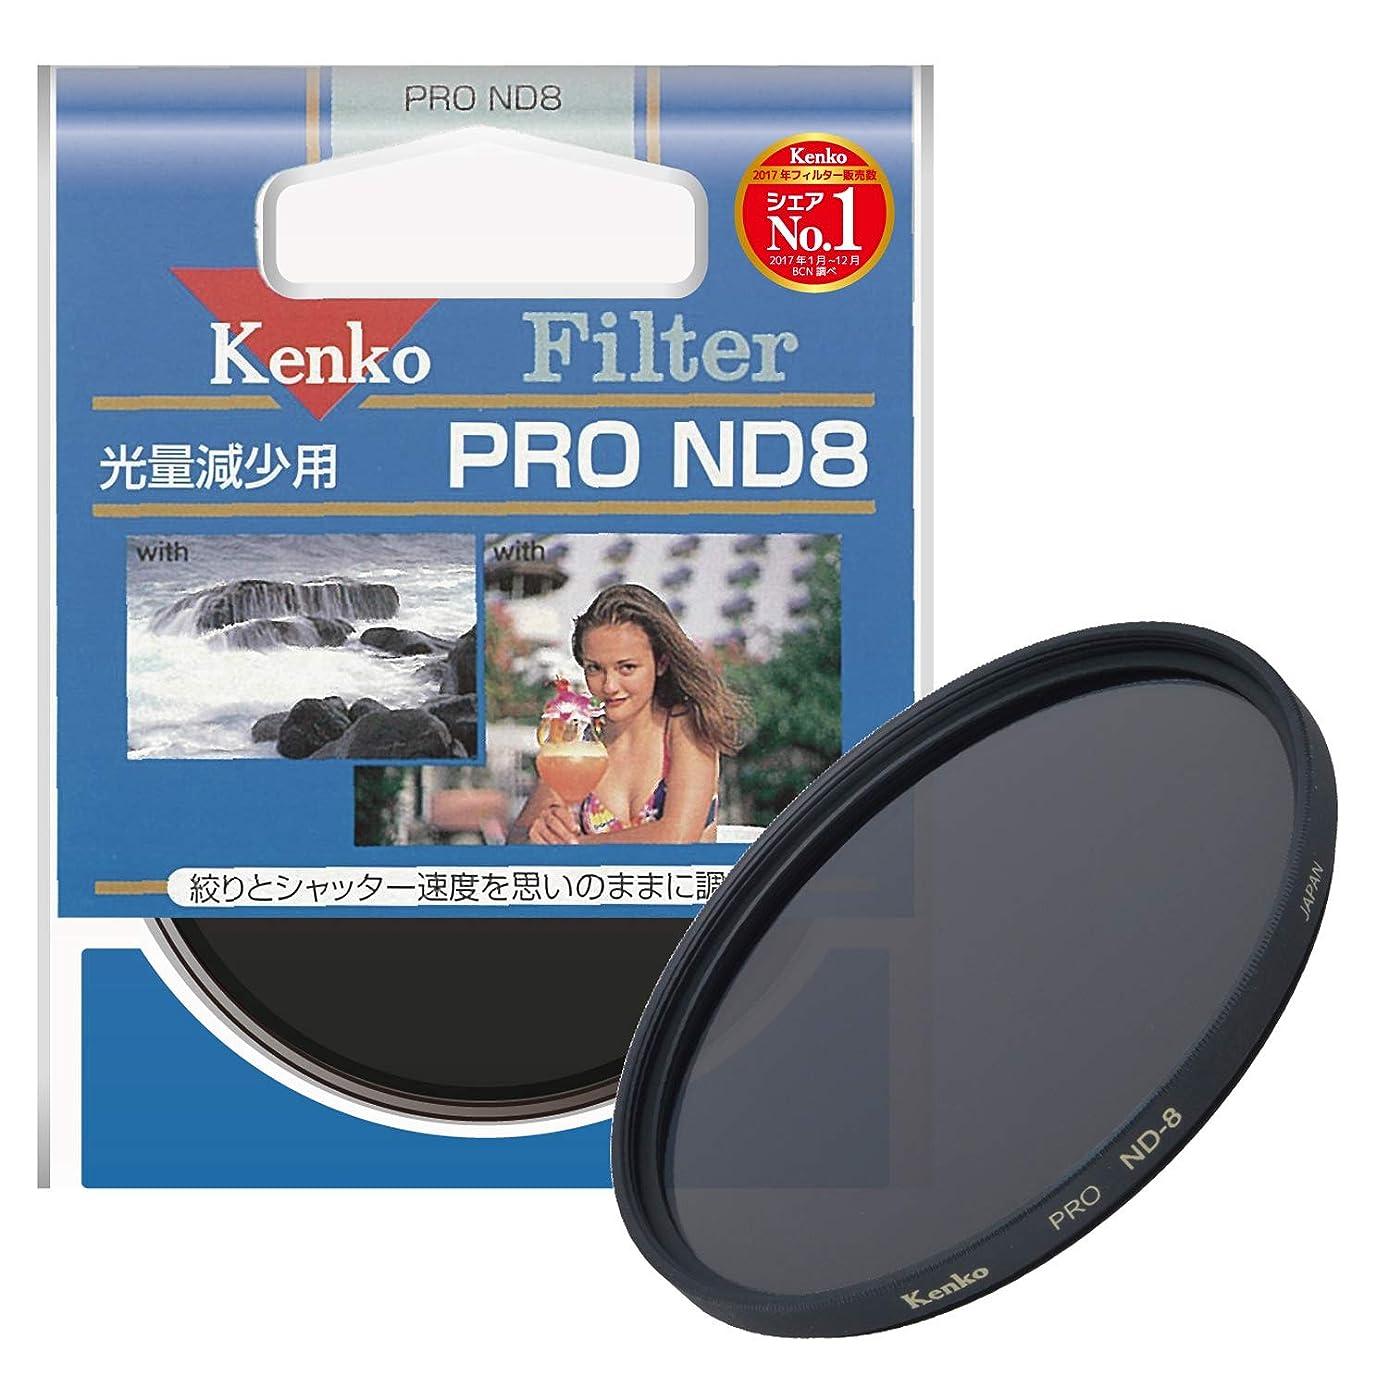 Kenko filter for camera PRO ND8 77mm for adjusting the amount of light 377 628